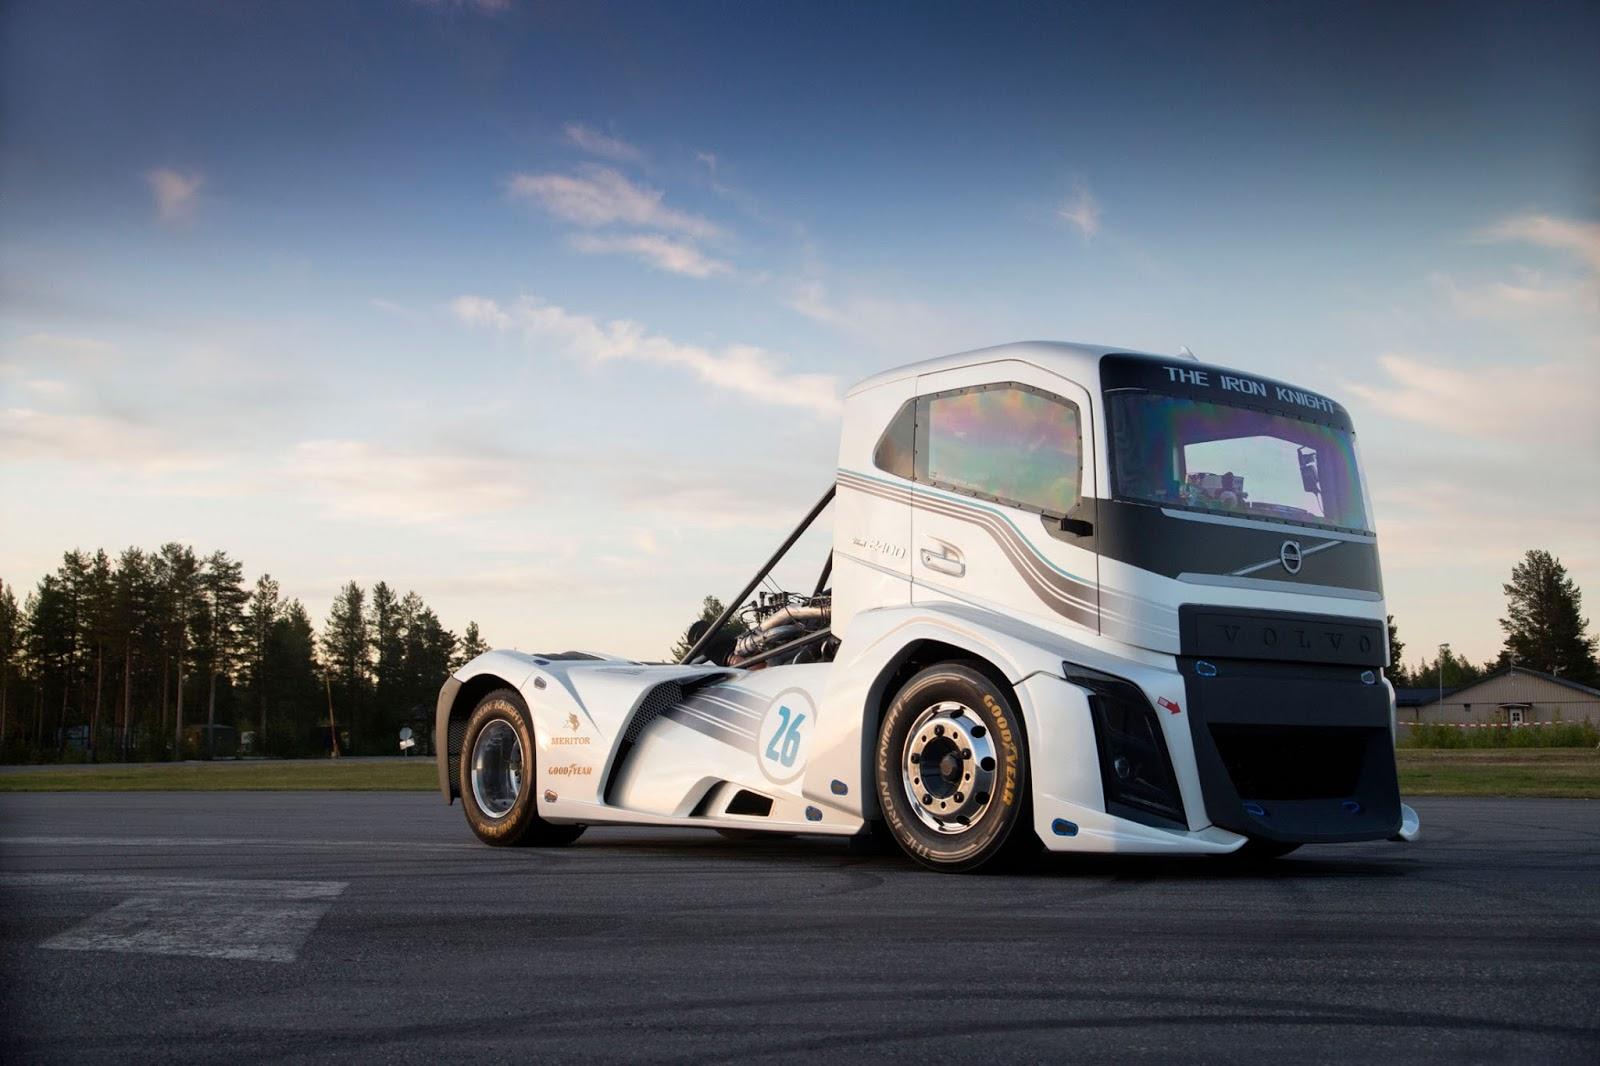 Iron2BKnight2Bvolvo Το Iron Knight της Volvo Trucks είναι το ταχύτερο φορτηγό του κόσμου Fun, Record, topspeed, Truck, videos, Volvo Iron Knight, Volvo Trucks, Επαγγελματικά, Φορτηγά